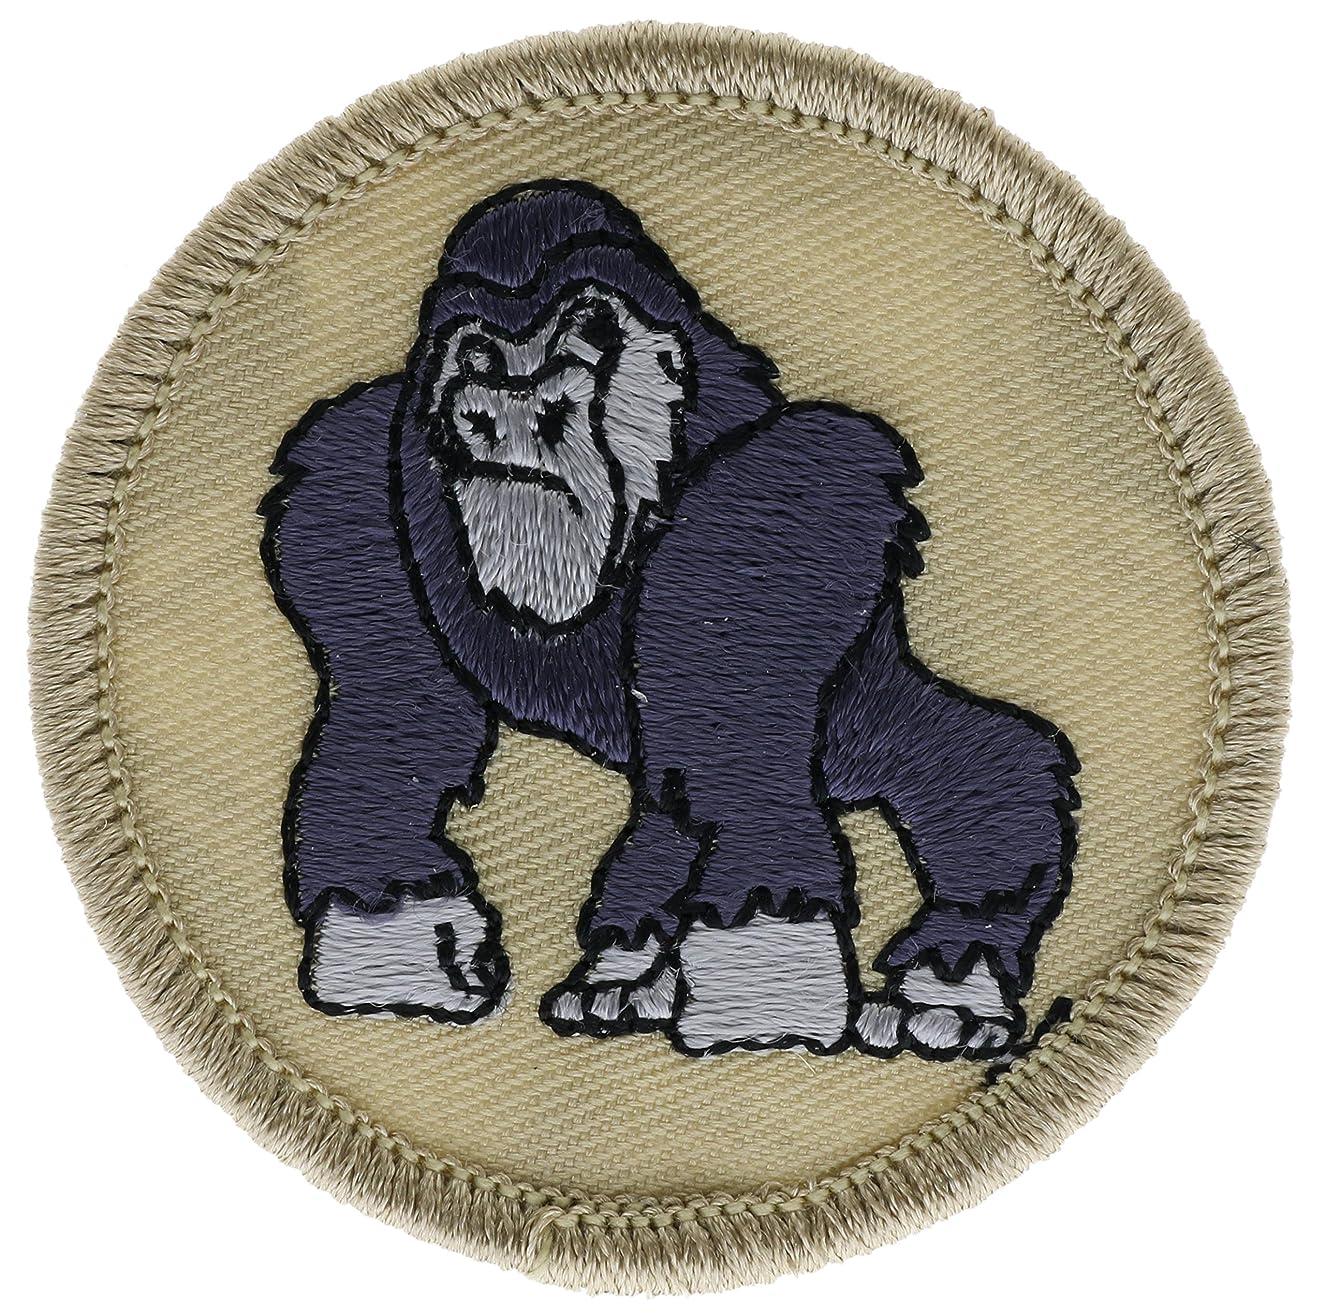 Gorilla Patrol 2 inch BSA Patch AVAQ0002